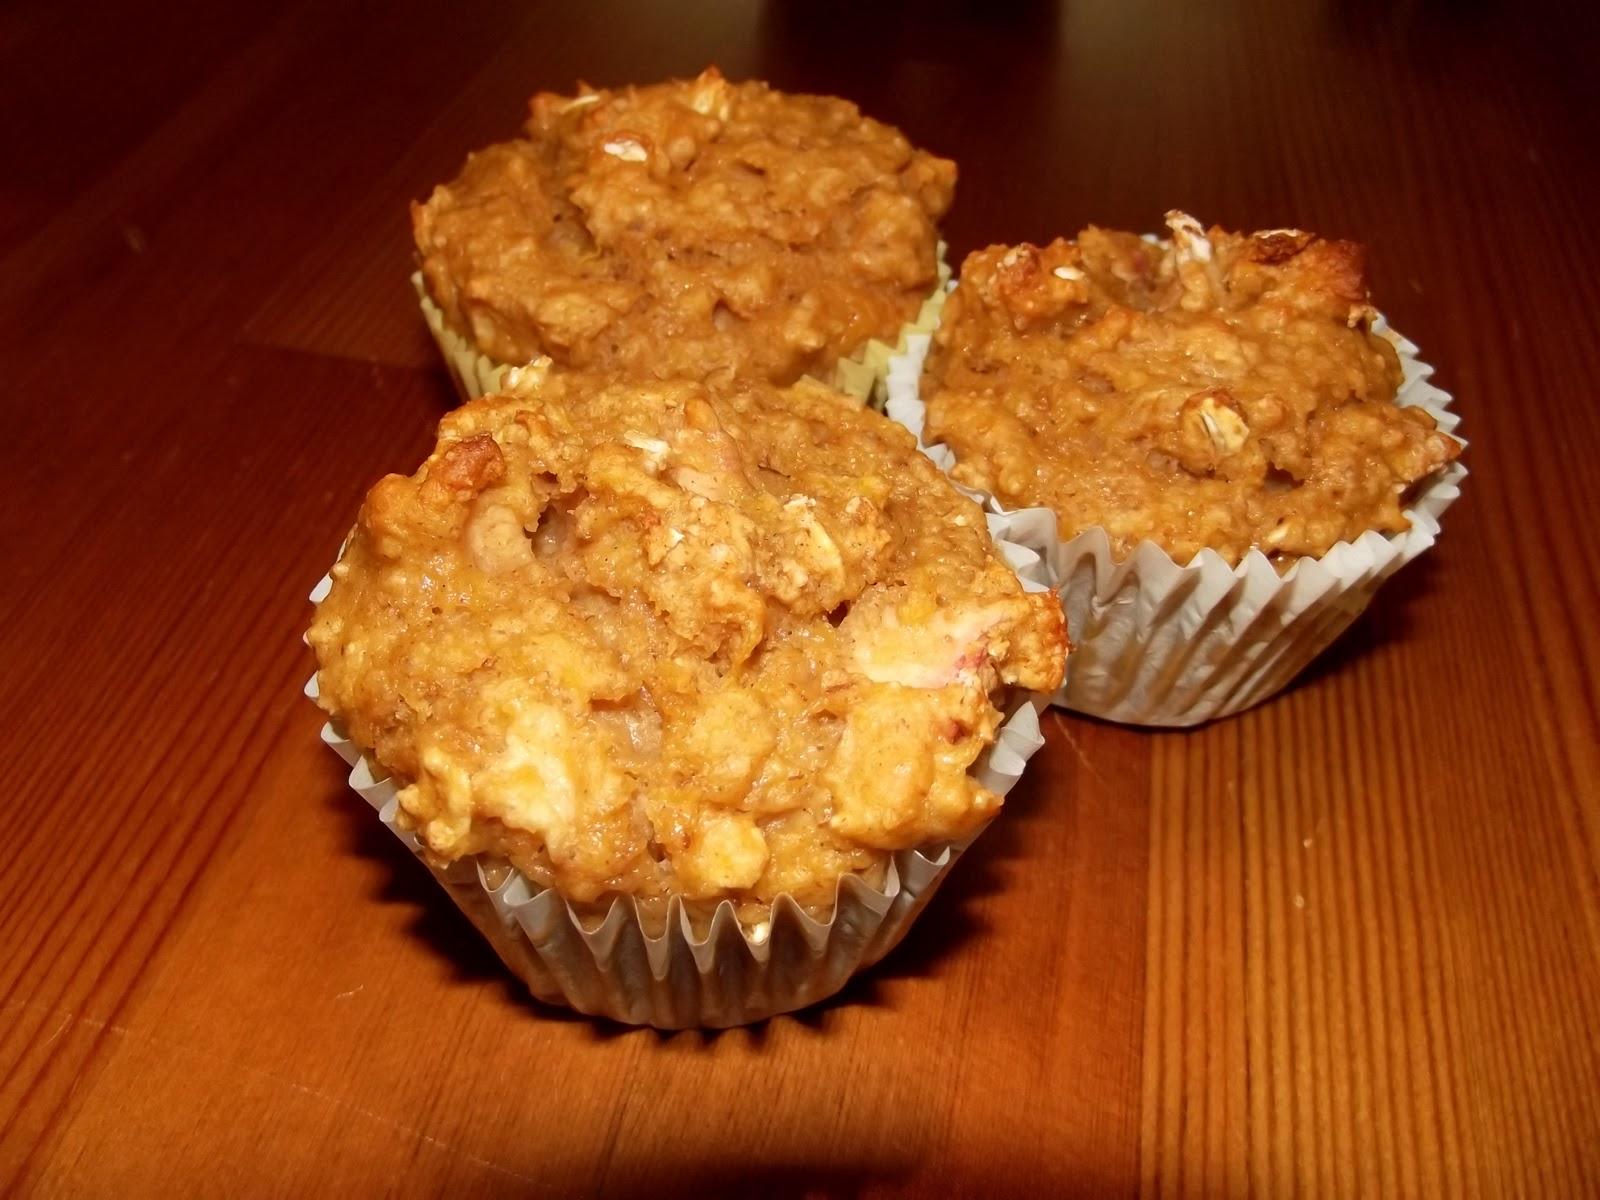 Fried Squash Muffins